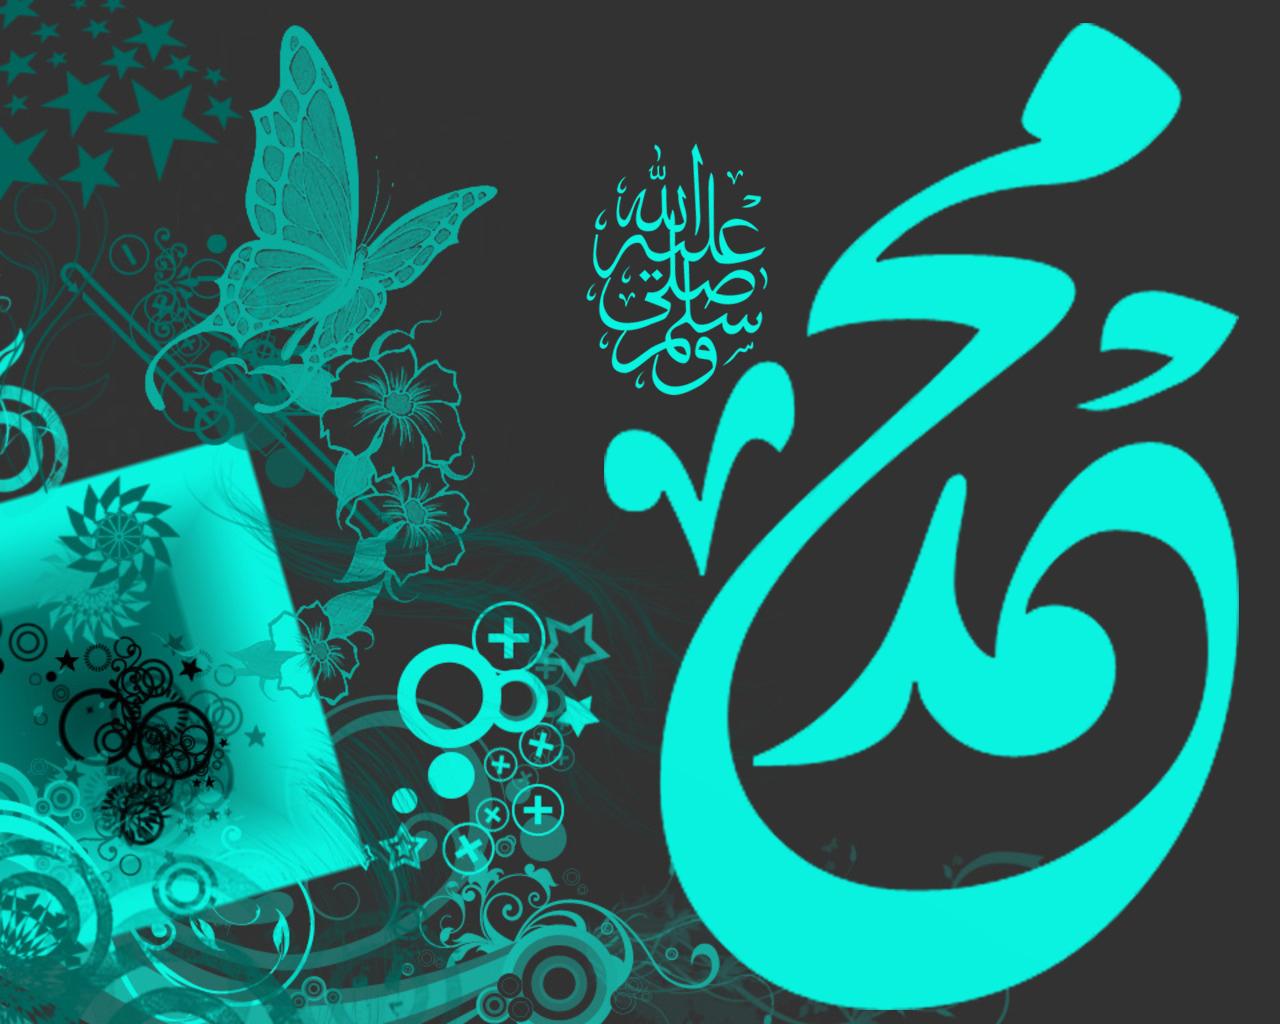 14841d1389133667 muhammad s w w name wallpapers muhammad wallpaperjpg 1280x1024